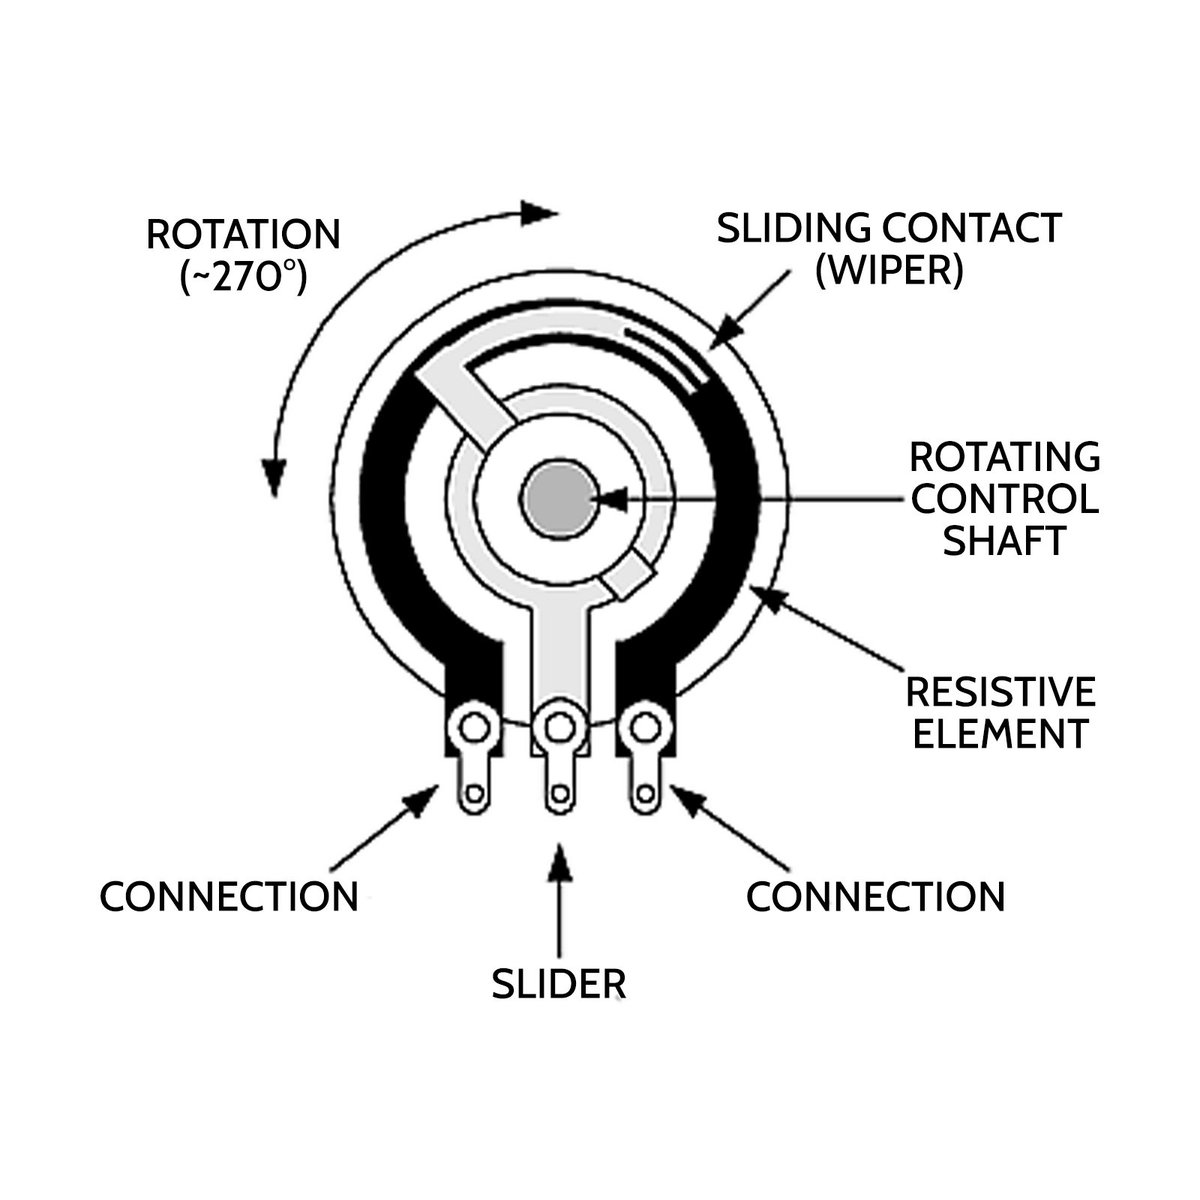 radio shack rheostat diagram